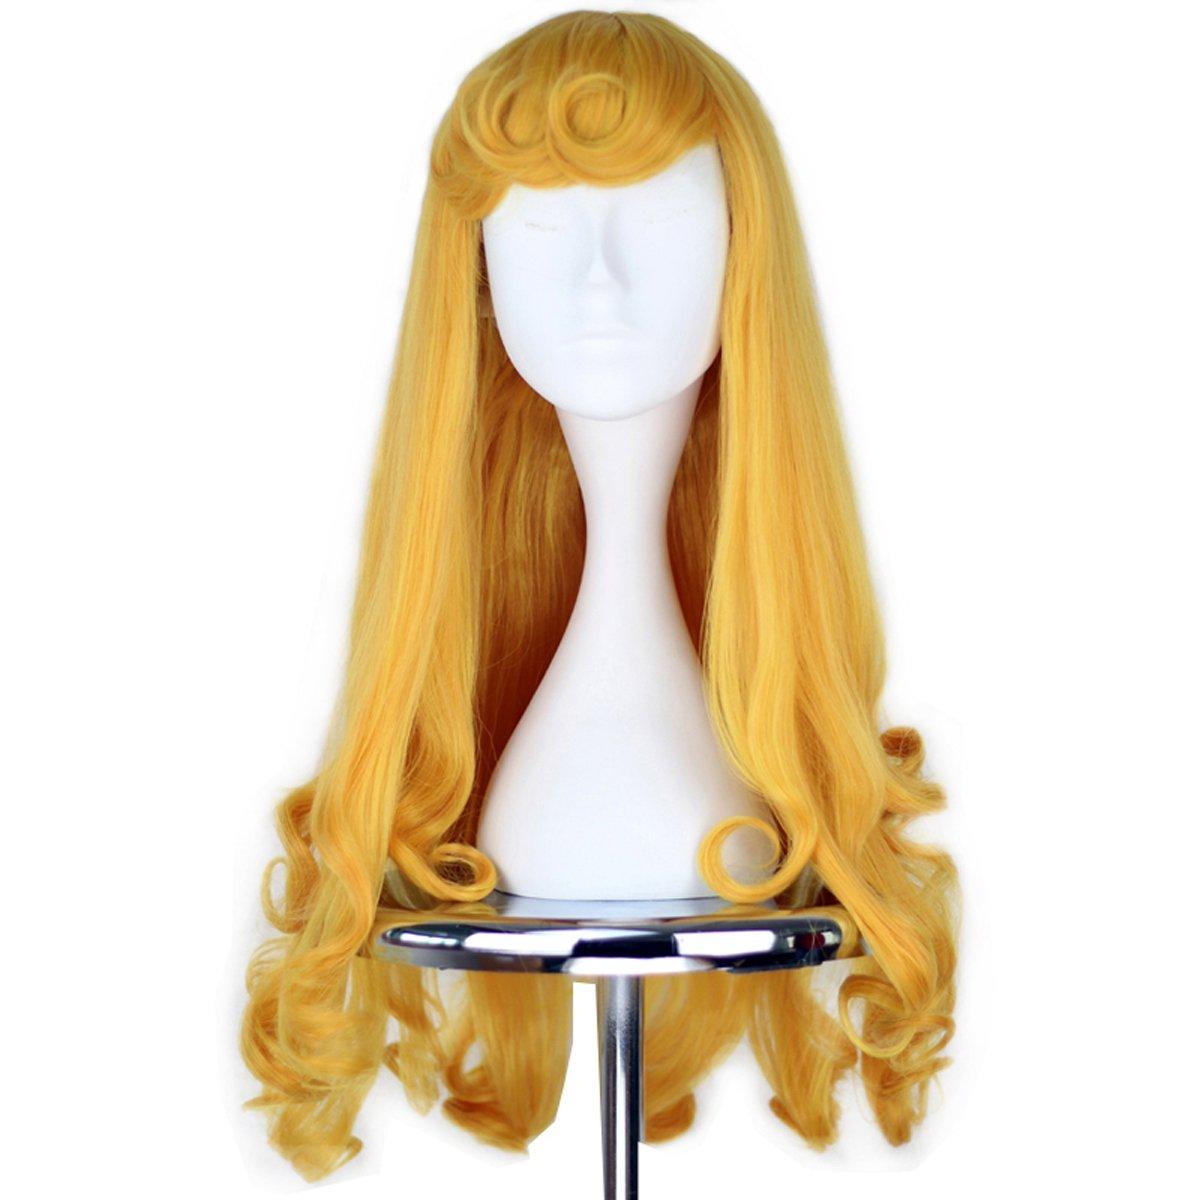 Girl's Prestyled Japan Maker New Princess Wig Long C Curly Yellow Cosplay Golden Nashville-Davidson Mall